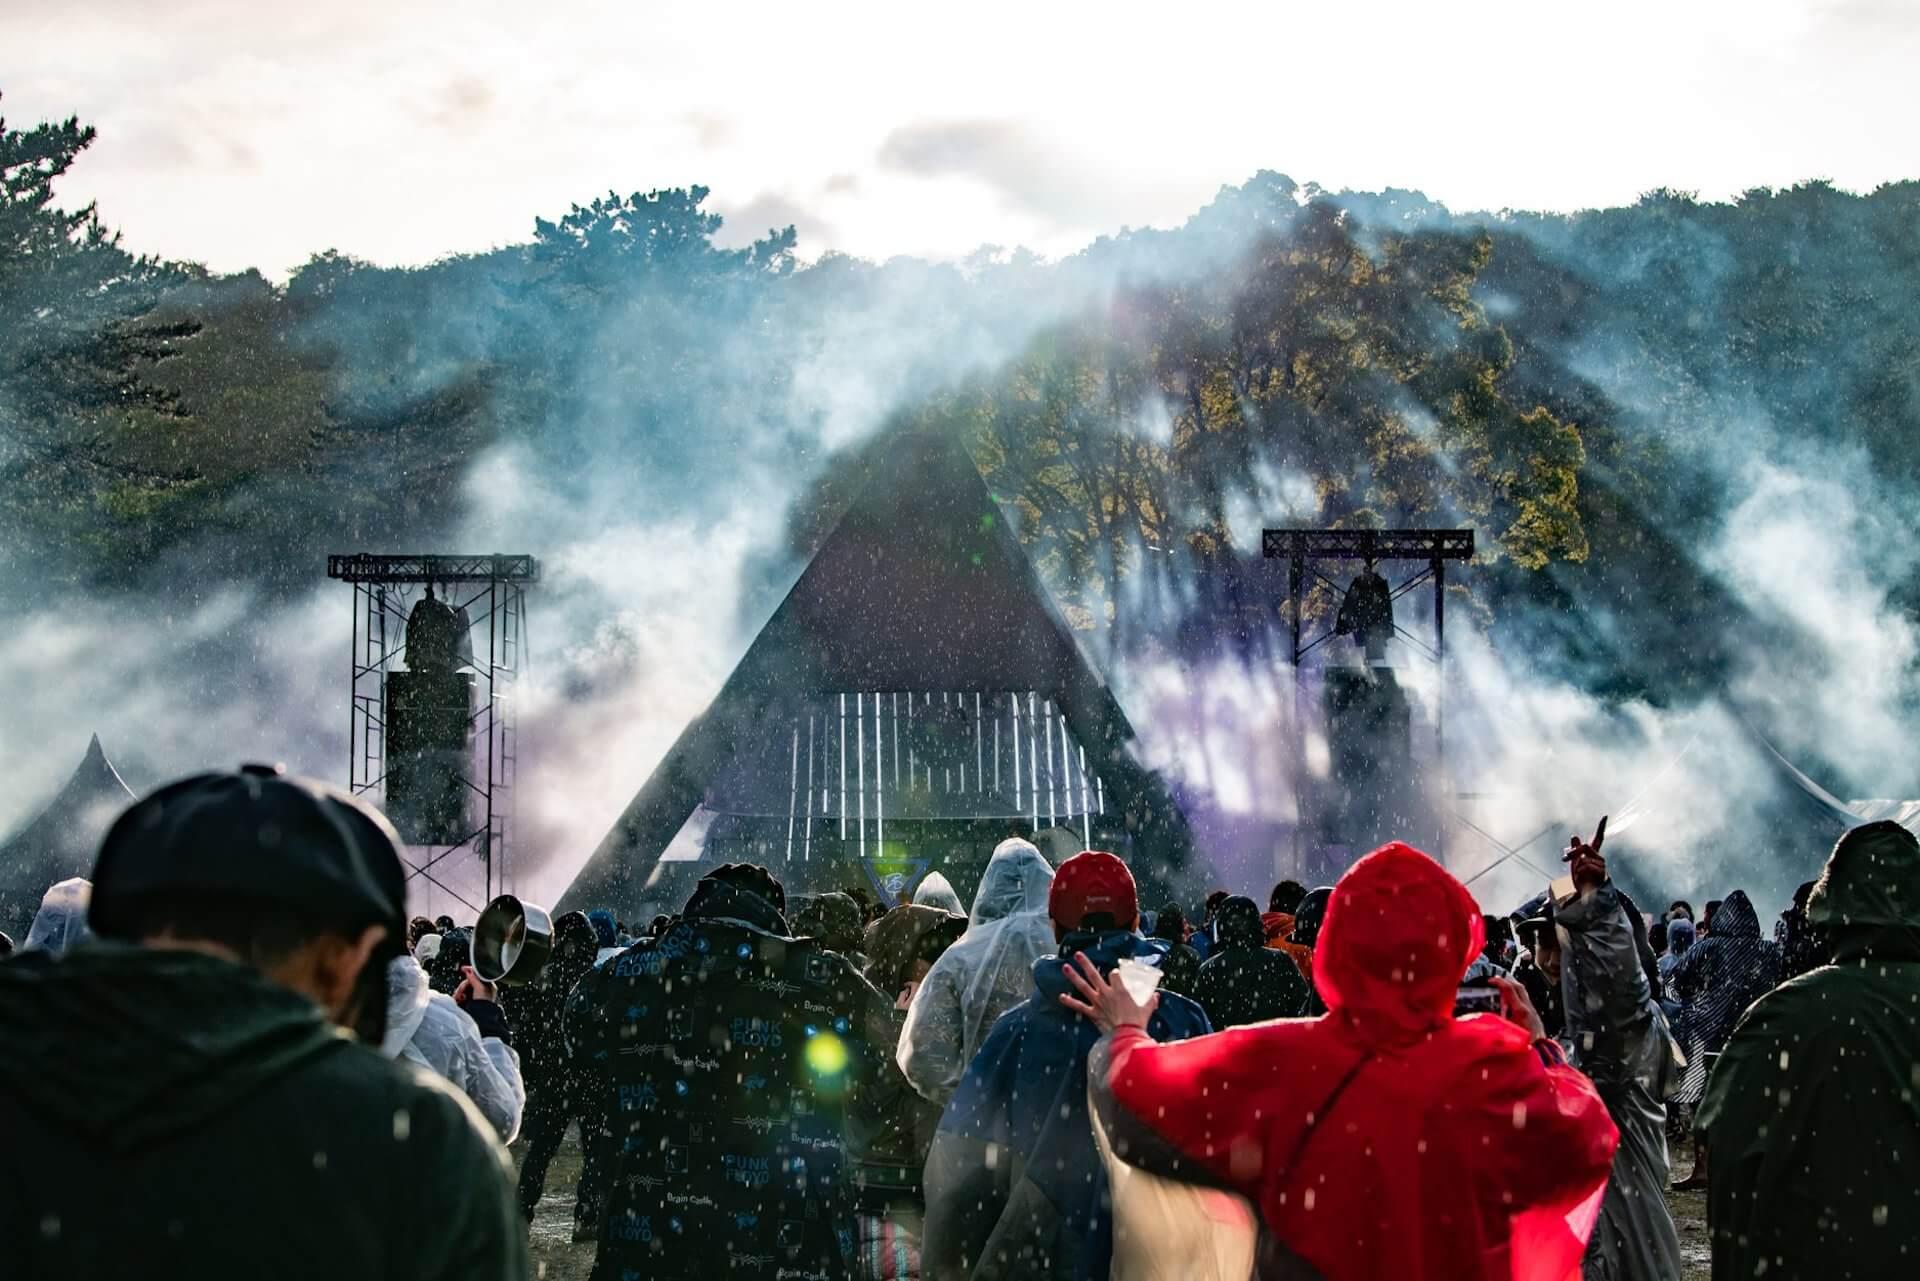 <RAINBOW DISCO CLUB>が初の野外オールナイト&7年ぶり都市型パーティーに!DJ Nobu、Wata Igarashi、Licaxxx、Sauce81ら第1弾ラインナップ発表 music210318_rdc2021_5